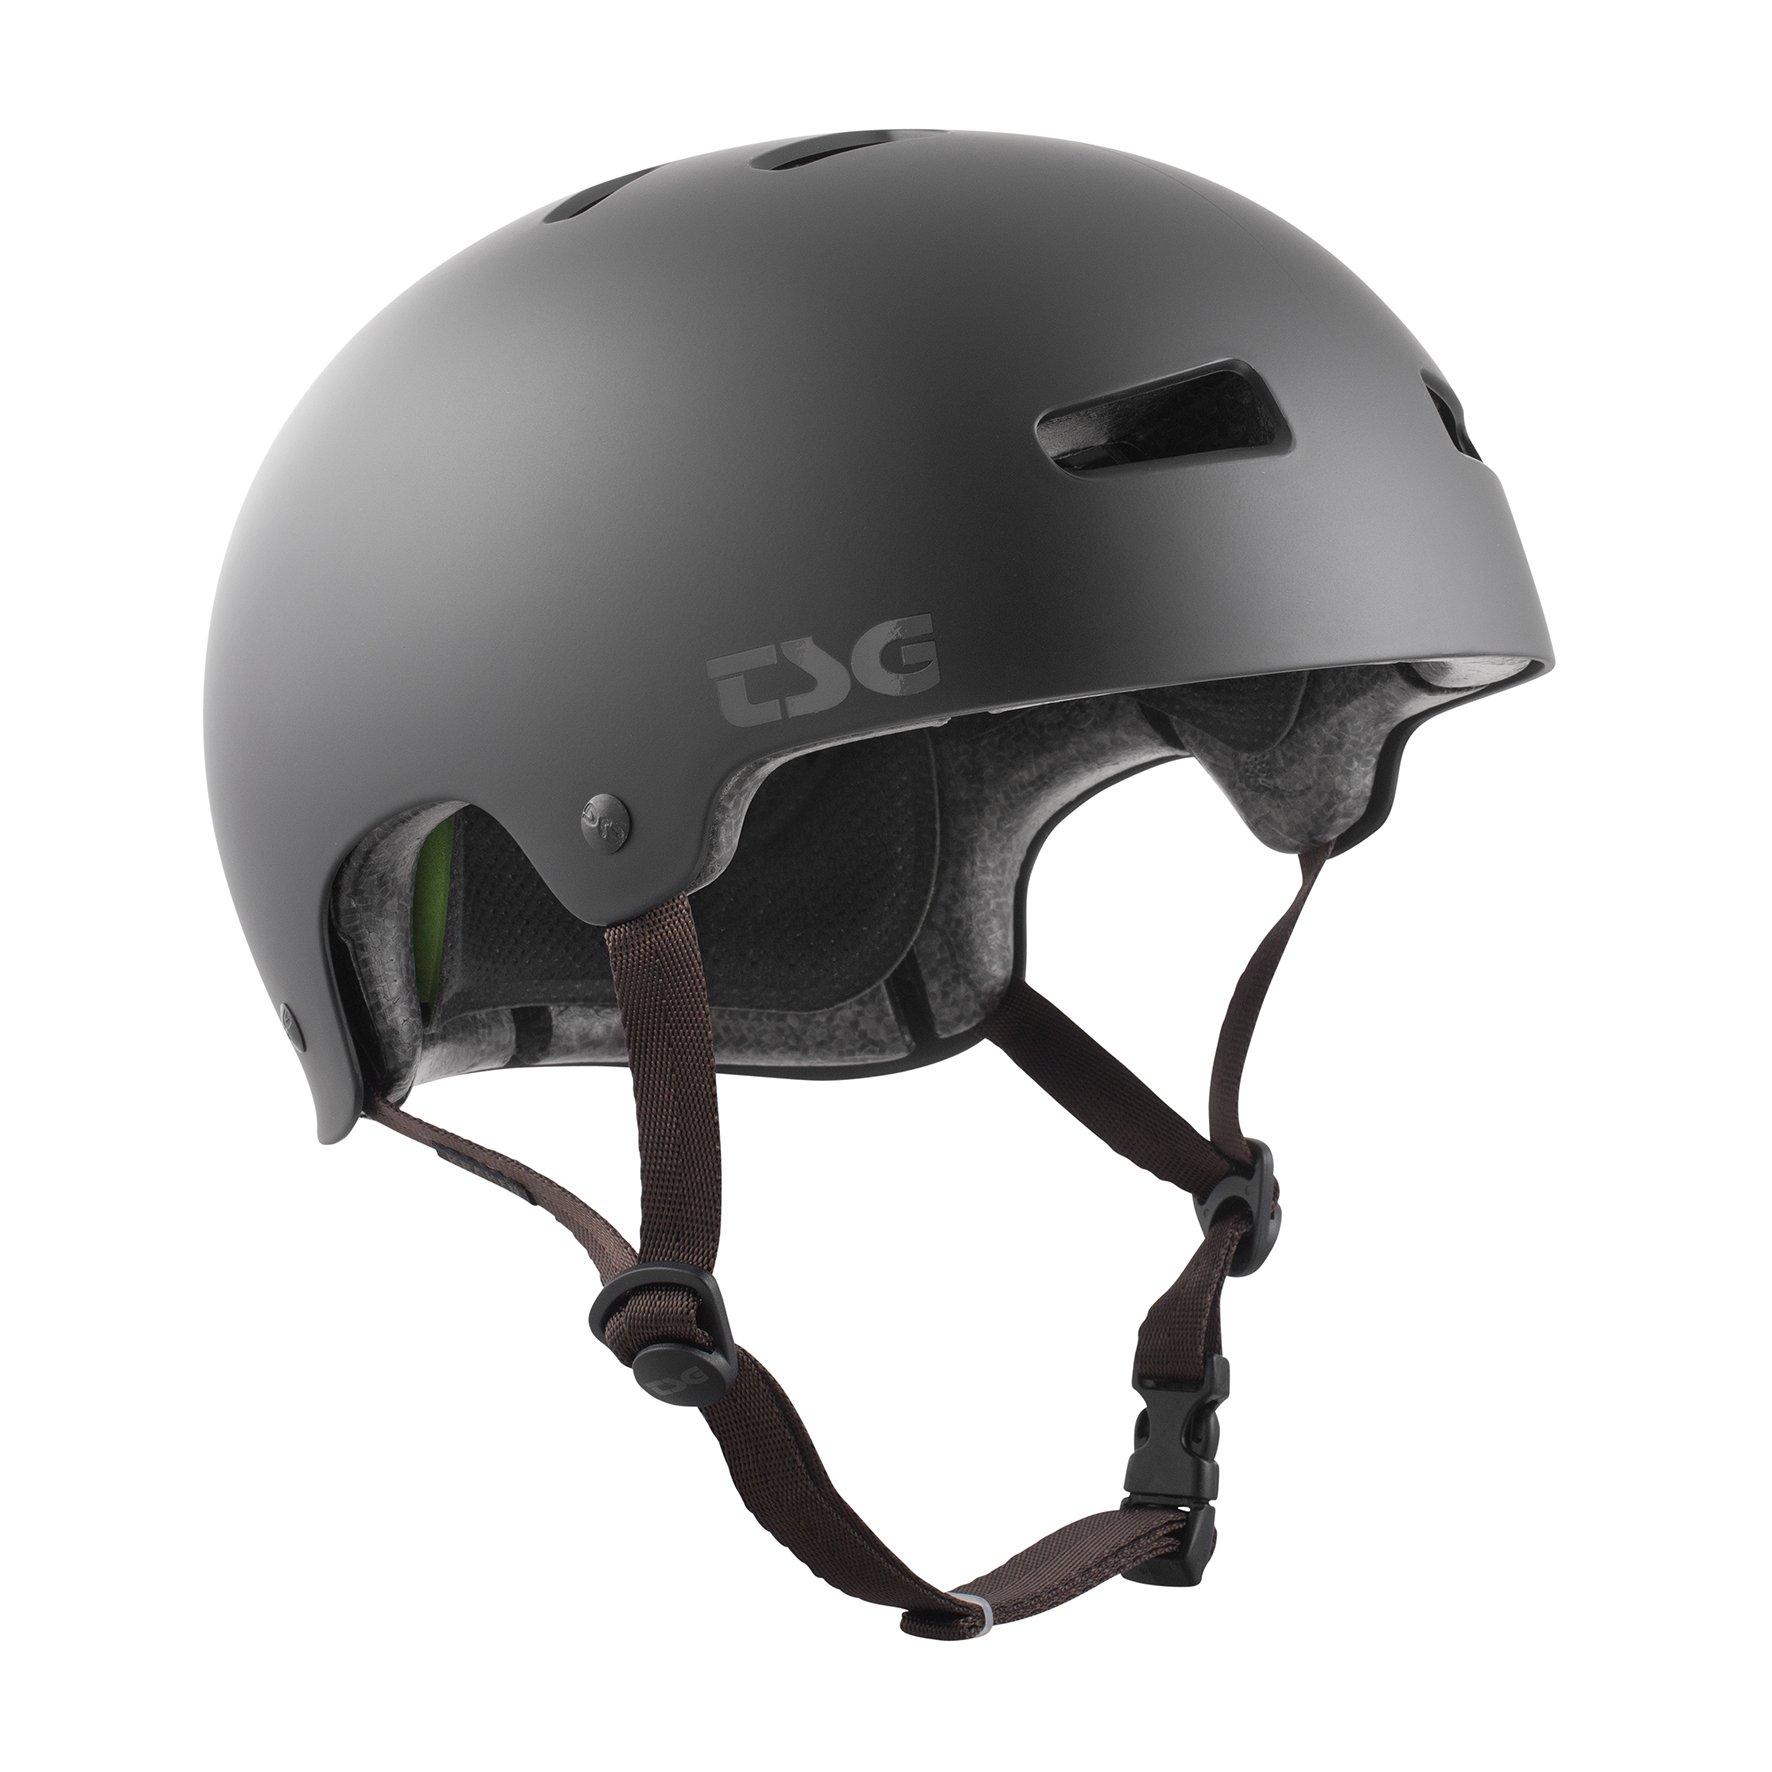 TSG Kinder Kraken Solid Color Helm, Satin Black, XXS/XS